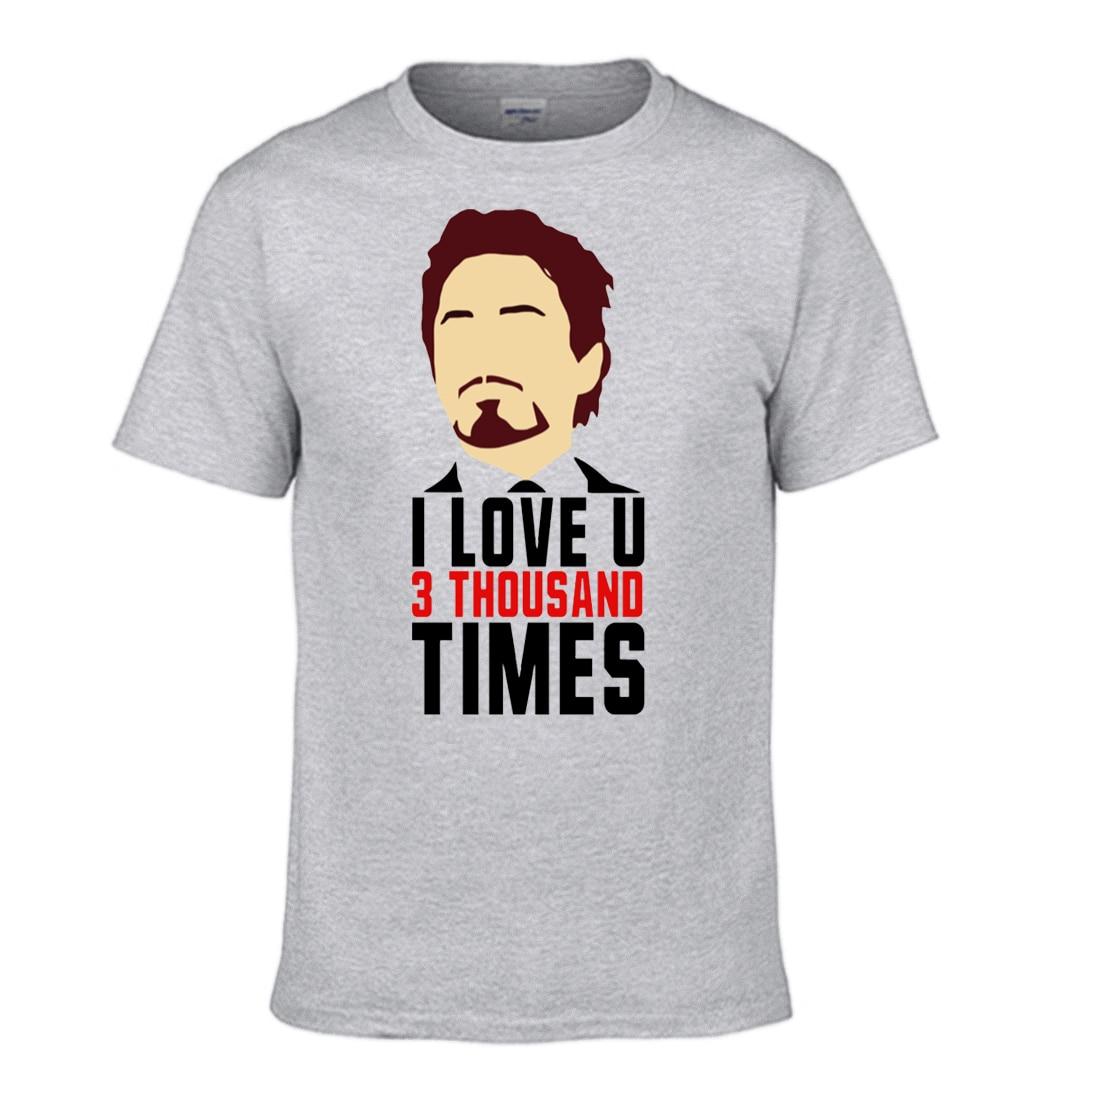 I Love You 3000 Iron Man T shirt Black Tshirt Men Super Hero Tony Stark Shirts Tshirts Cotton Short Sleeve Funny Cool T-Shirt